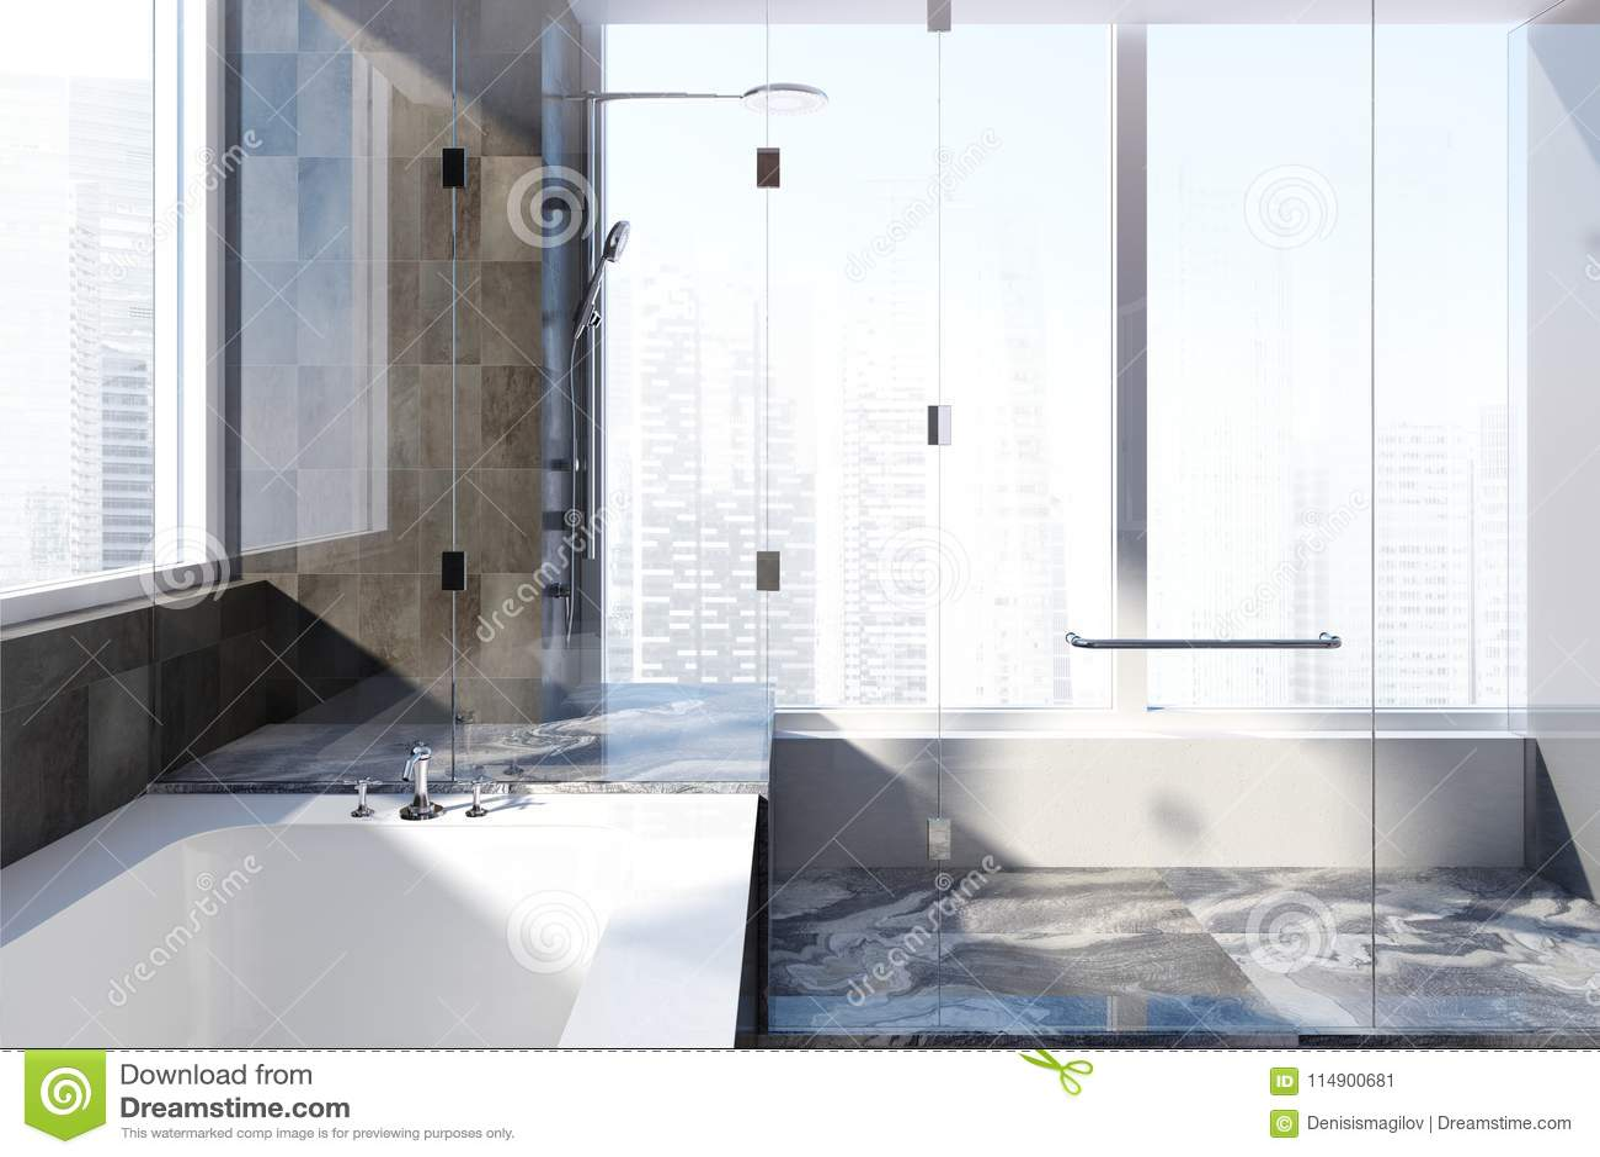 Black Marble Bathroom Interior Stock Illustration - Illustration of ...